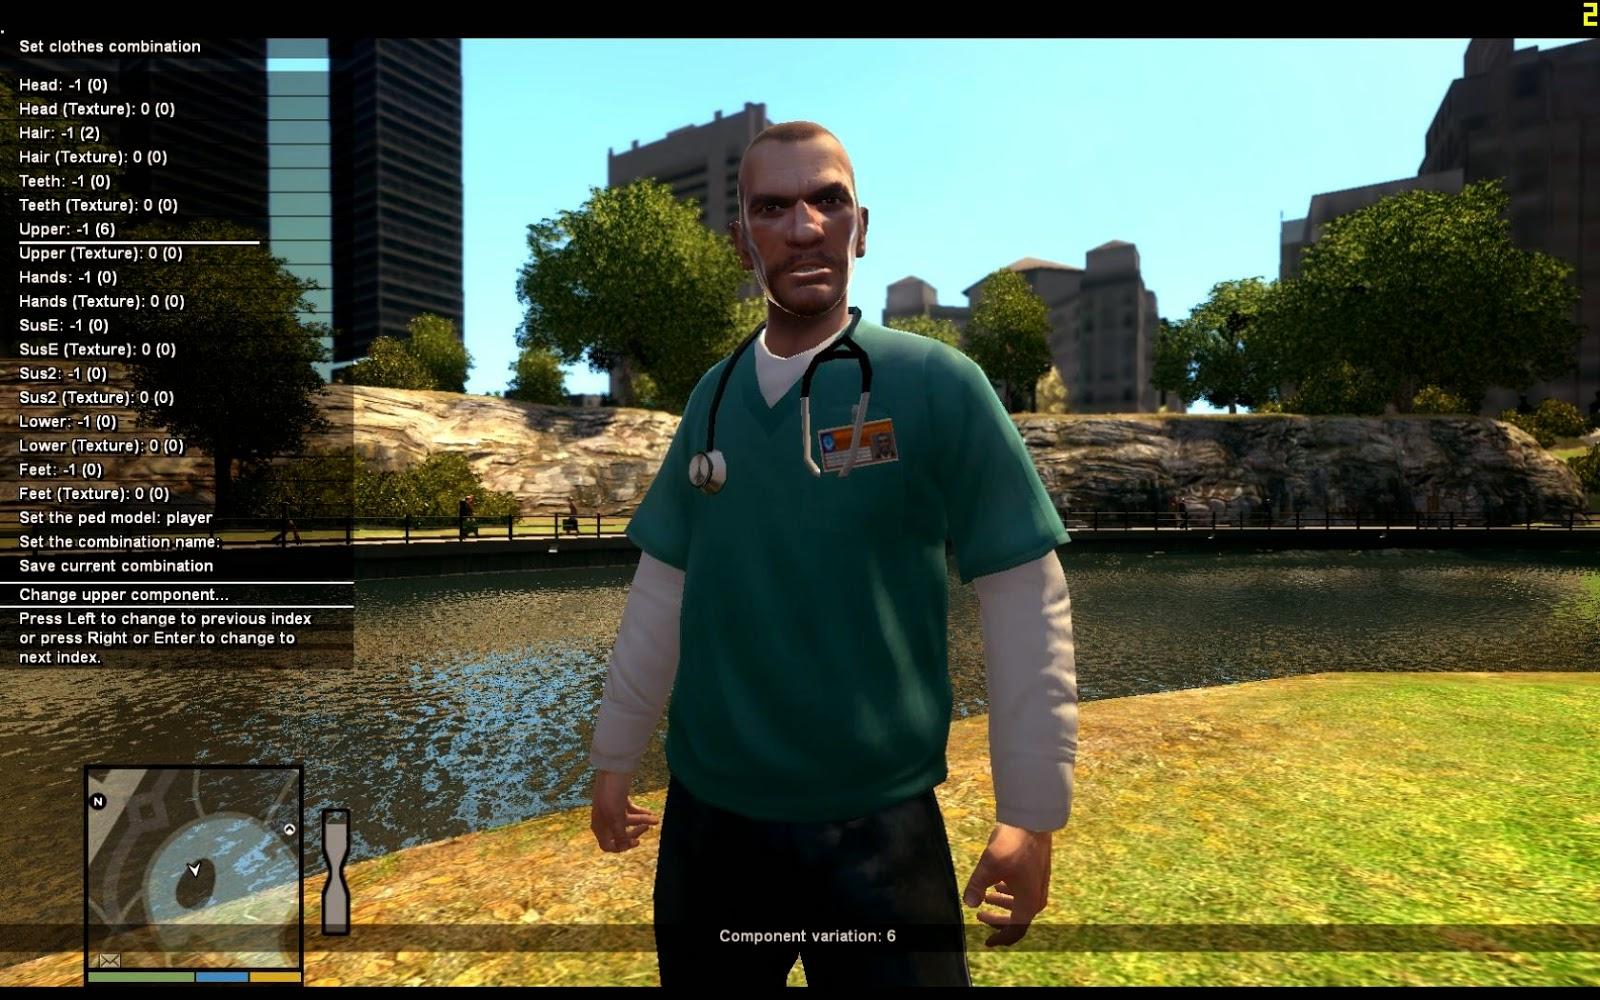 Gta 5 online cool clothes combinations